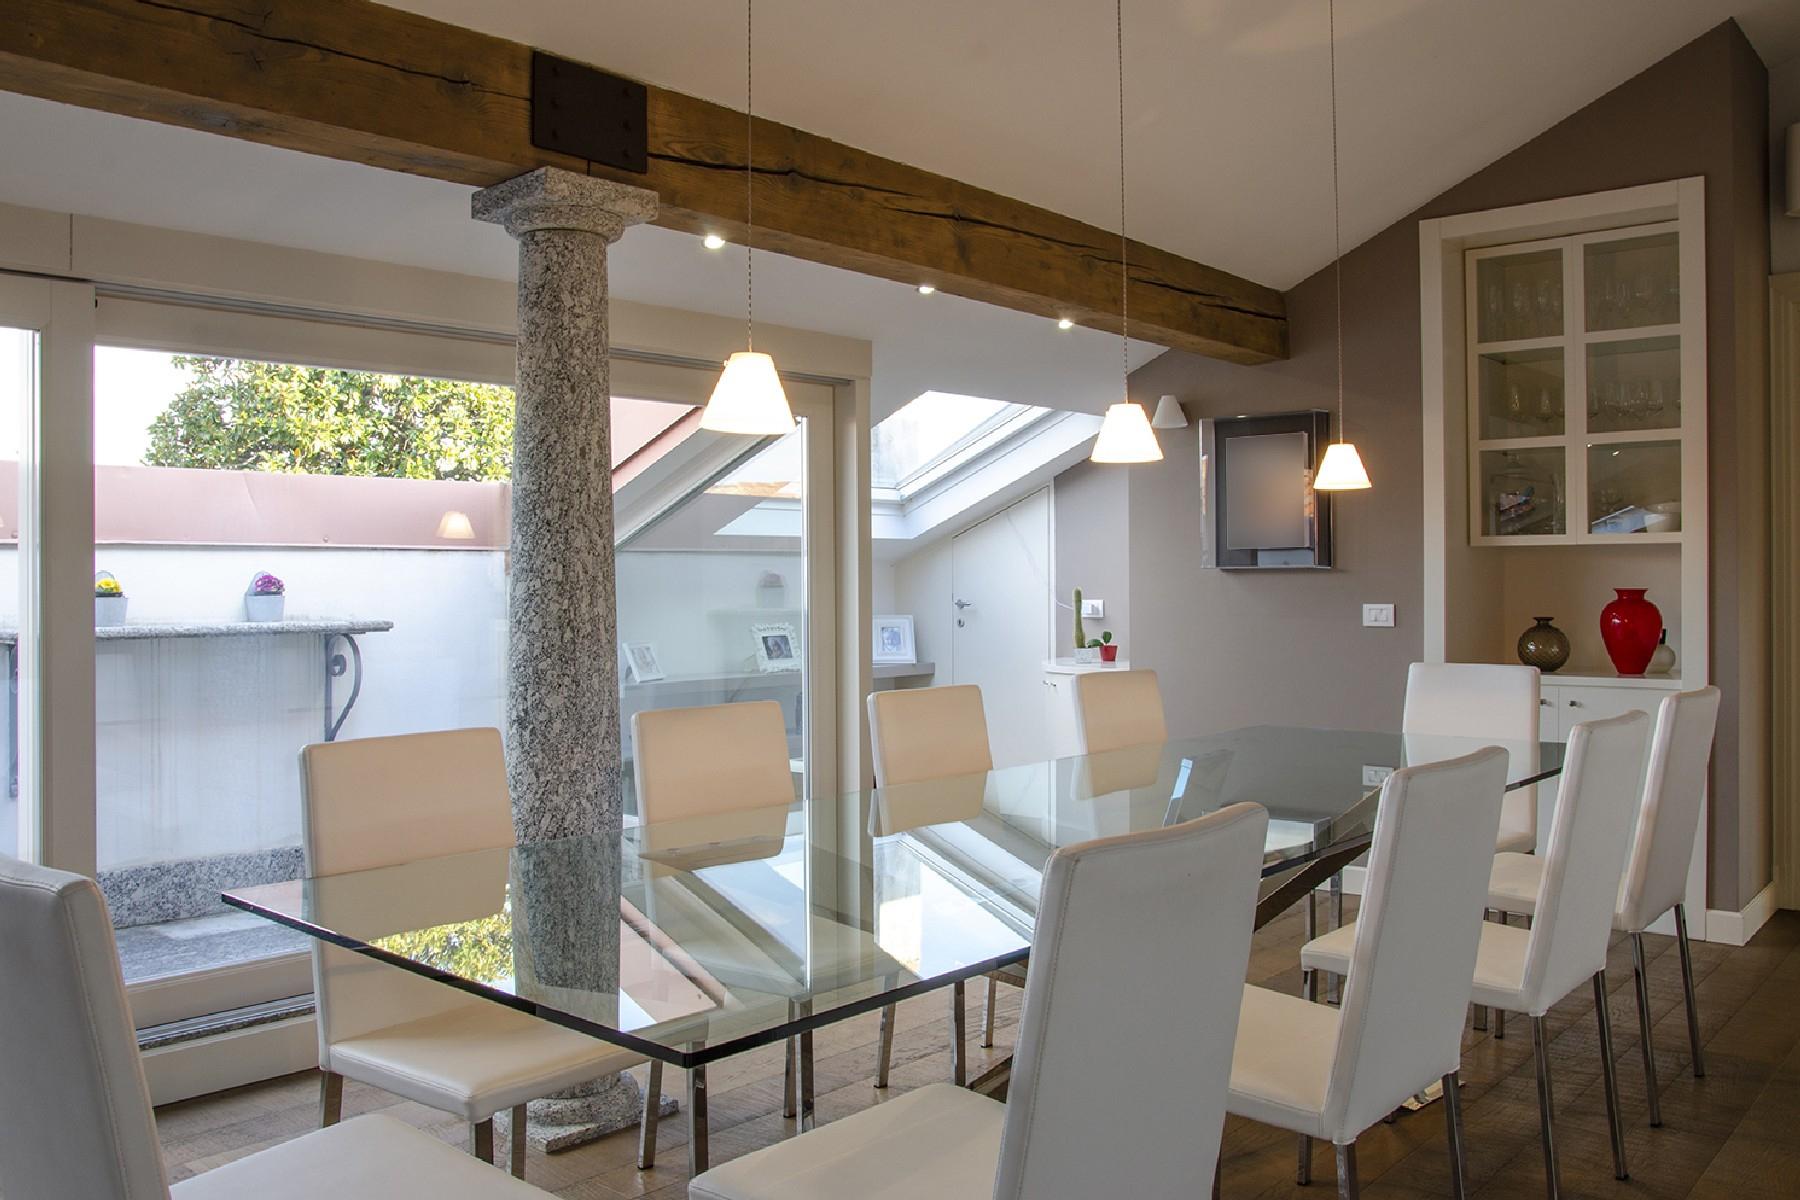 Appartamento in Vendita a Merate: 4 locali, 225 mq - Foto 5